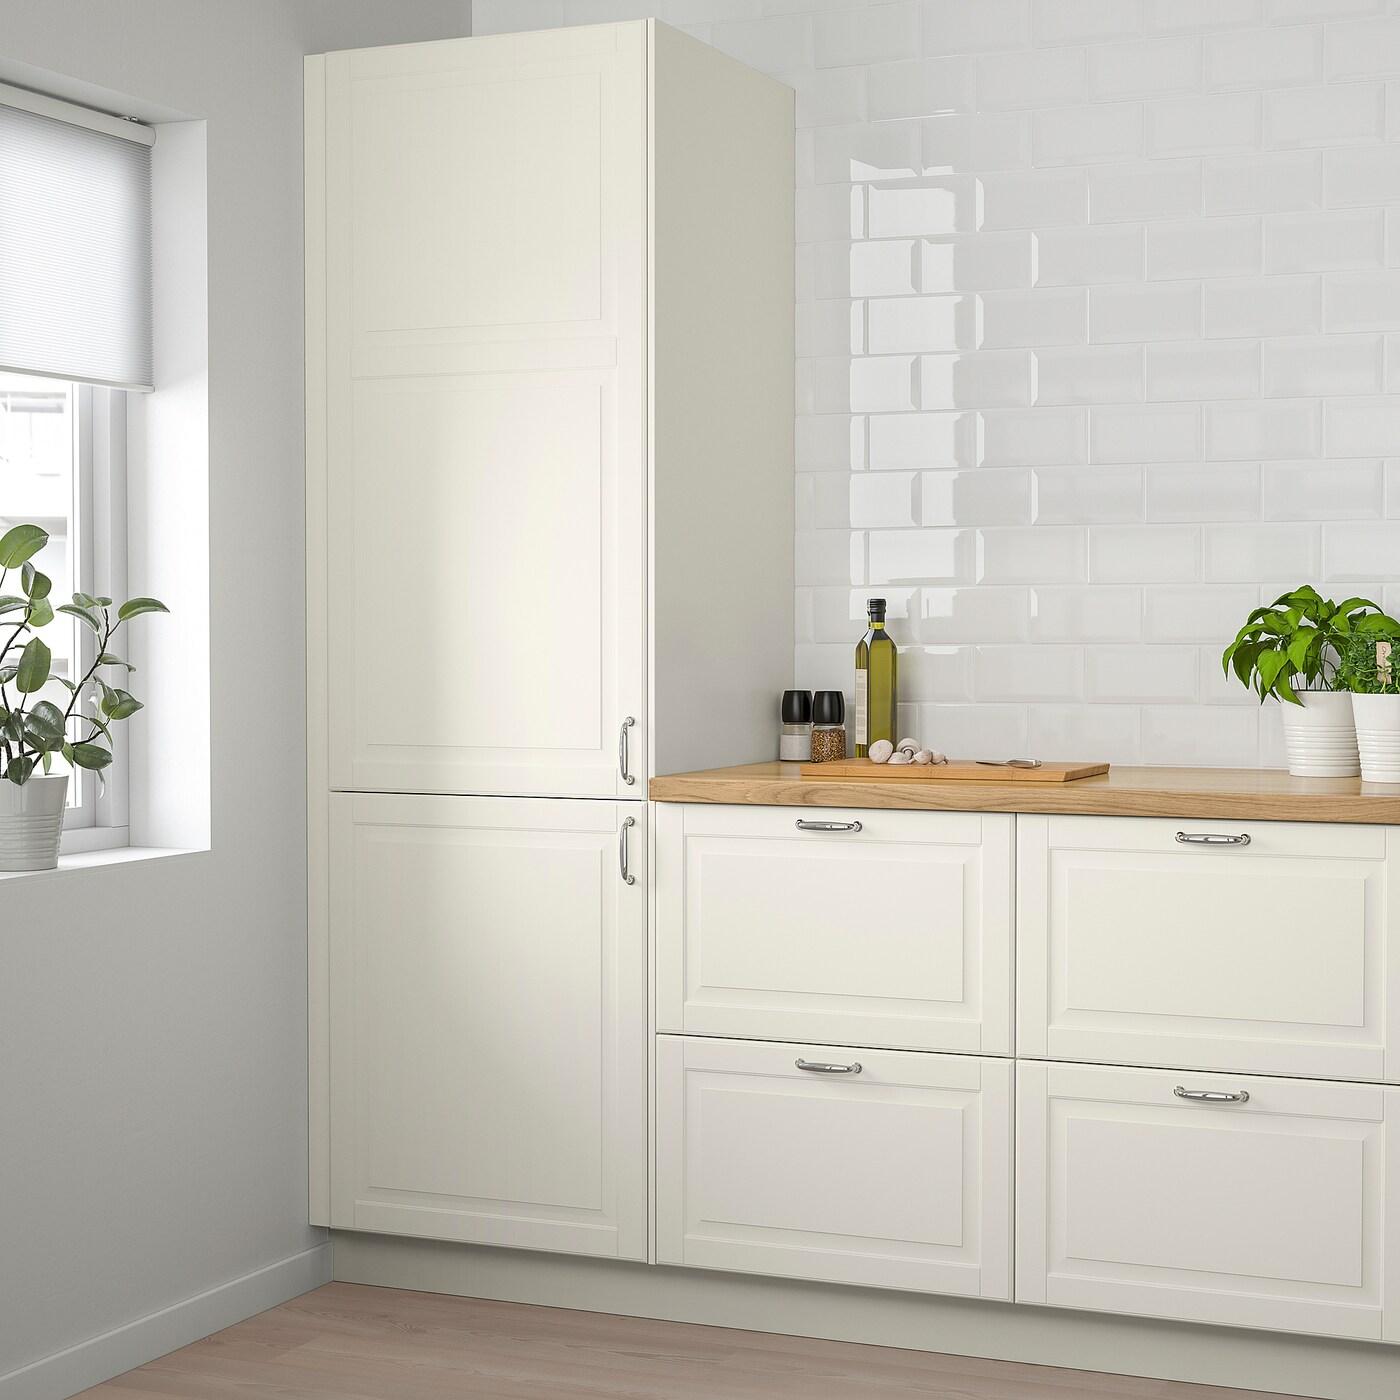 Bodbyn Porte Blanc Casse Ikea